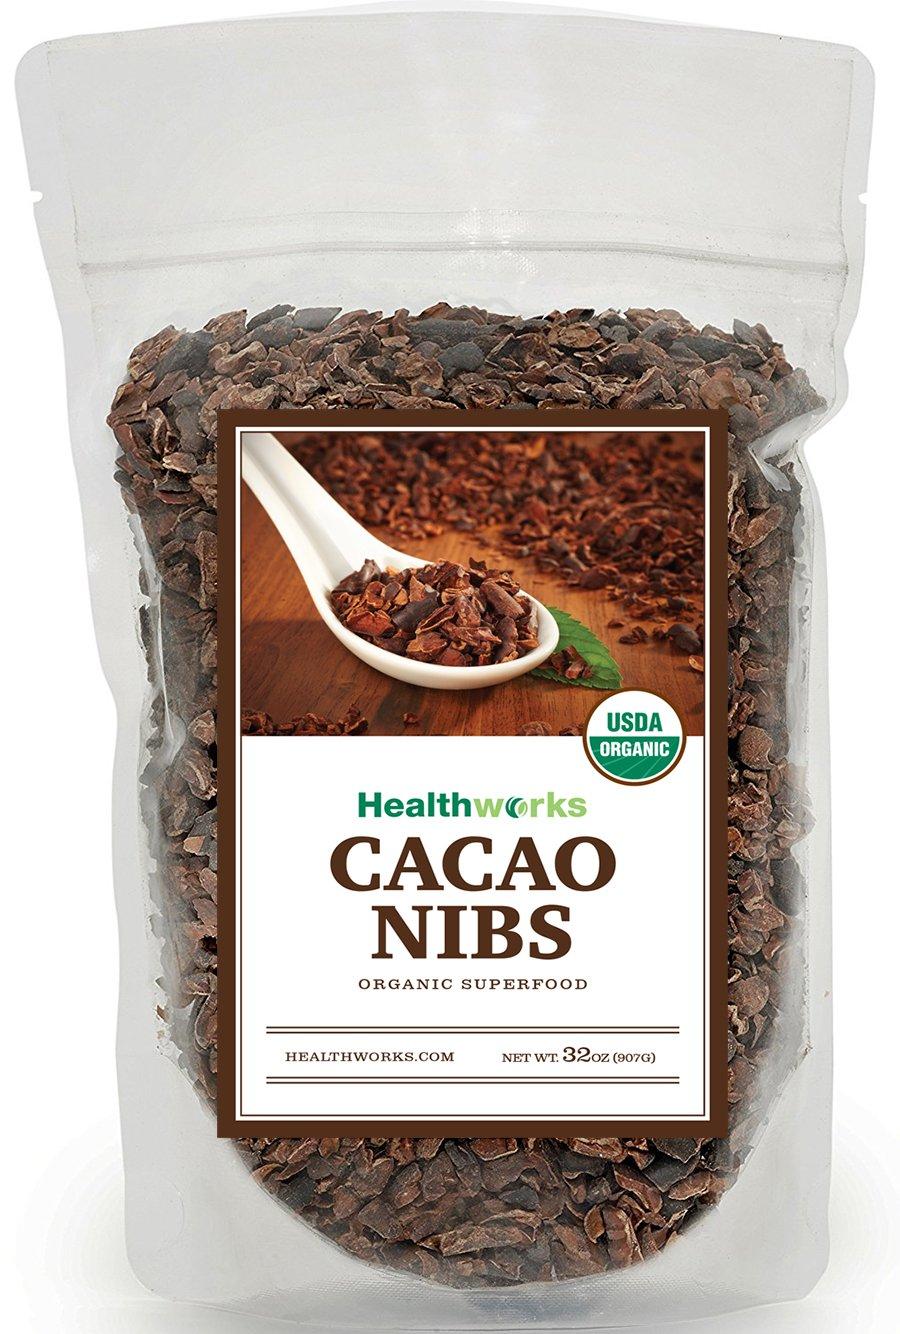 Healthworks Cacao Nibs Organic, 2lb